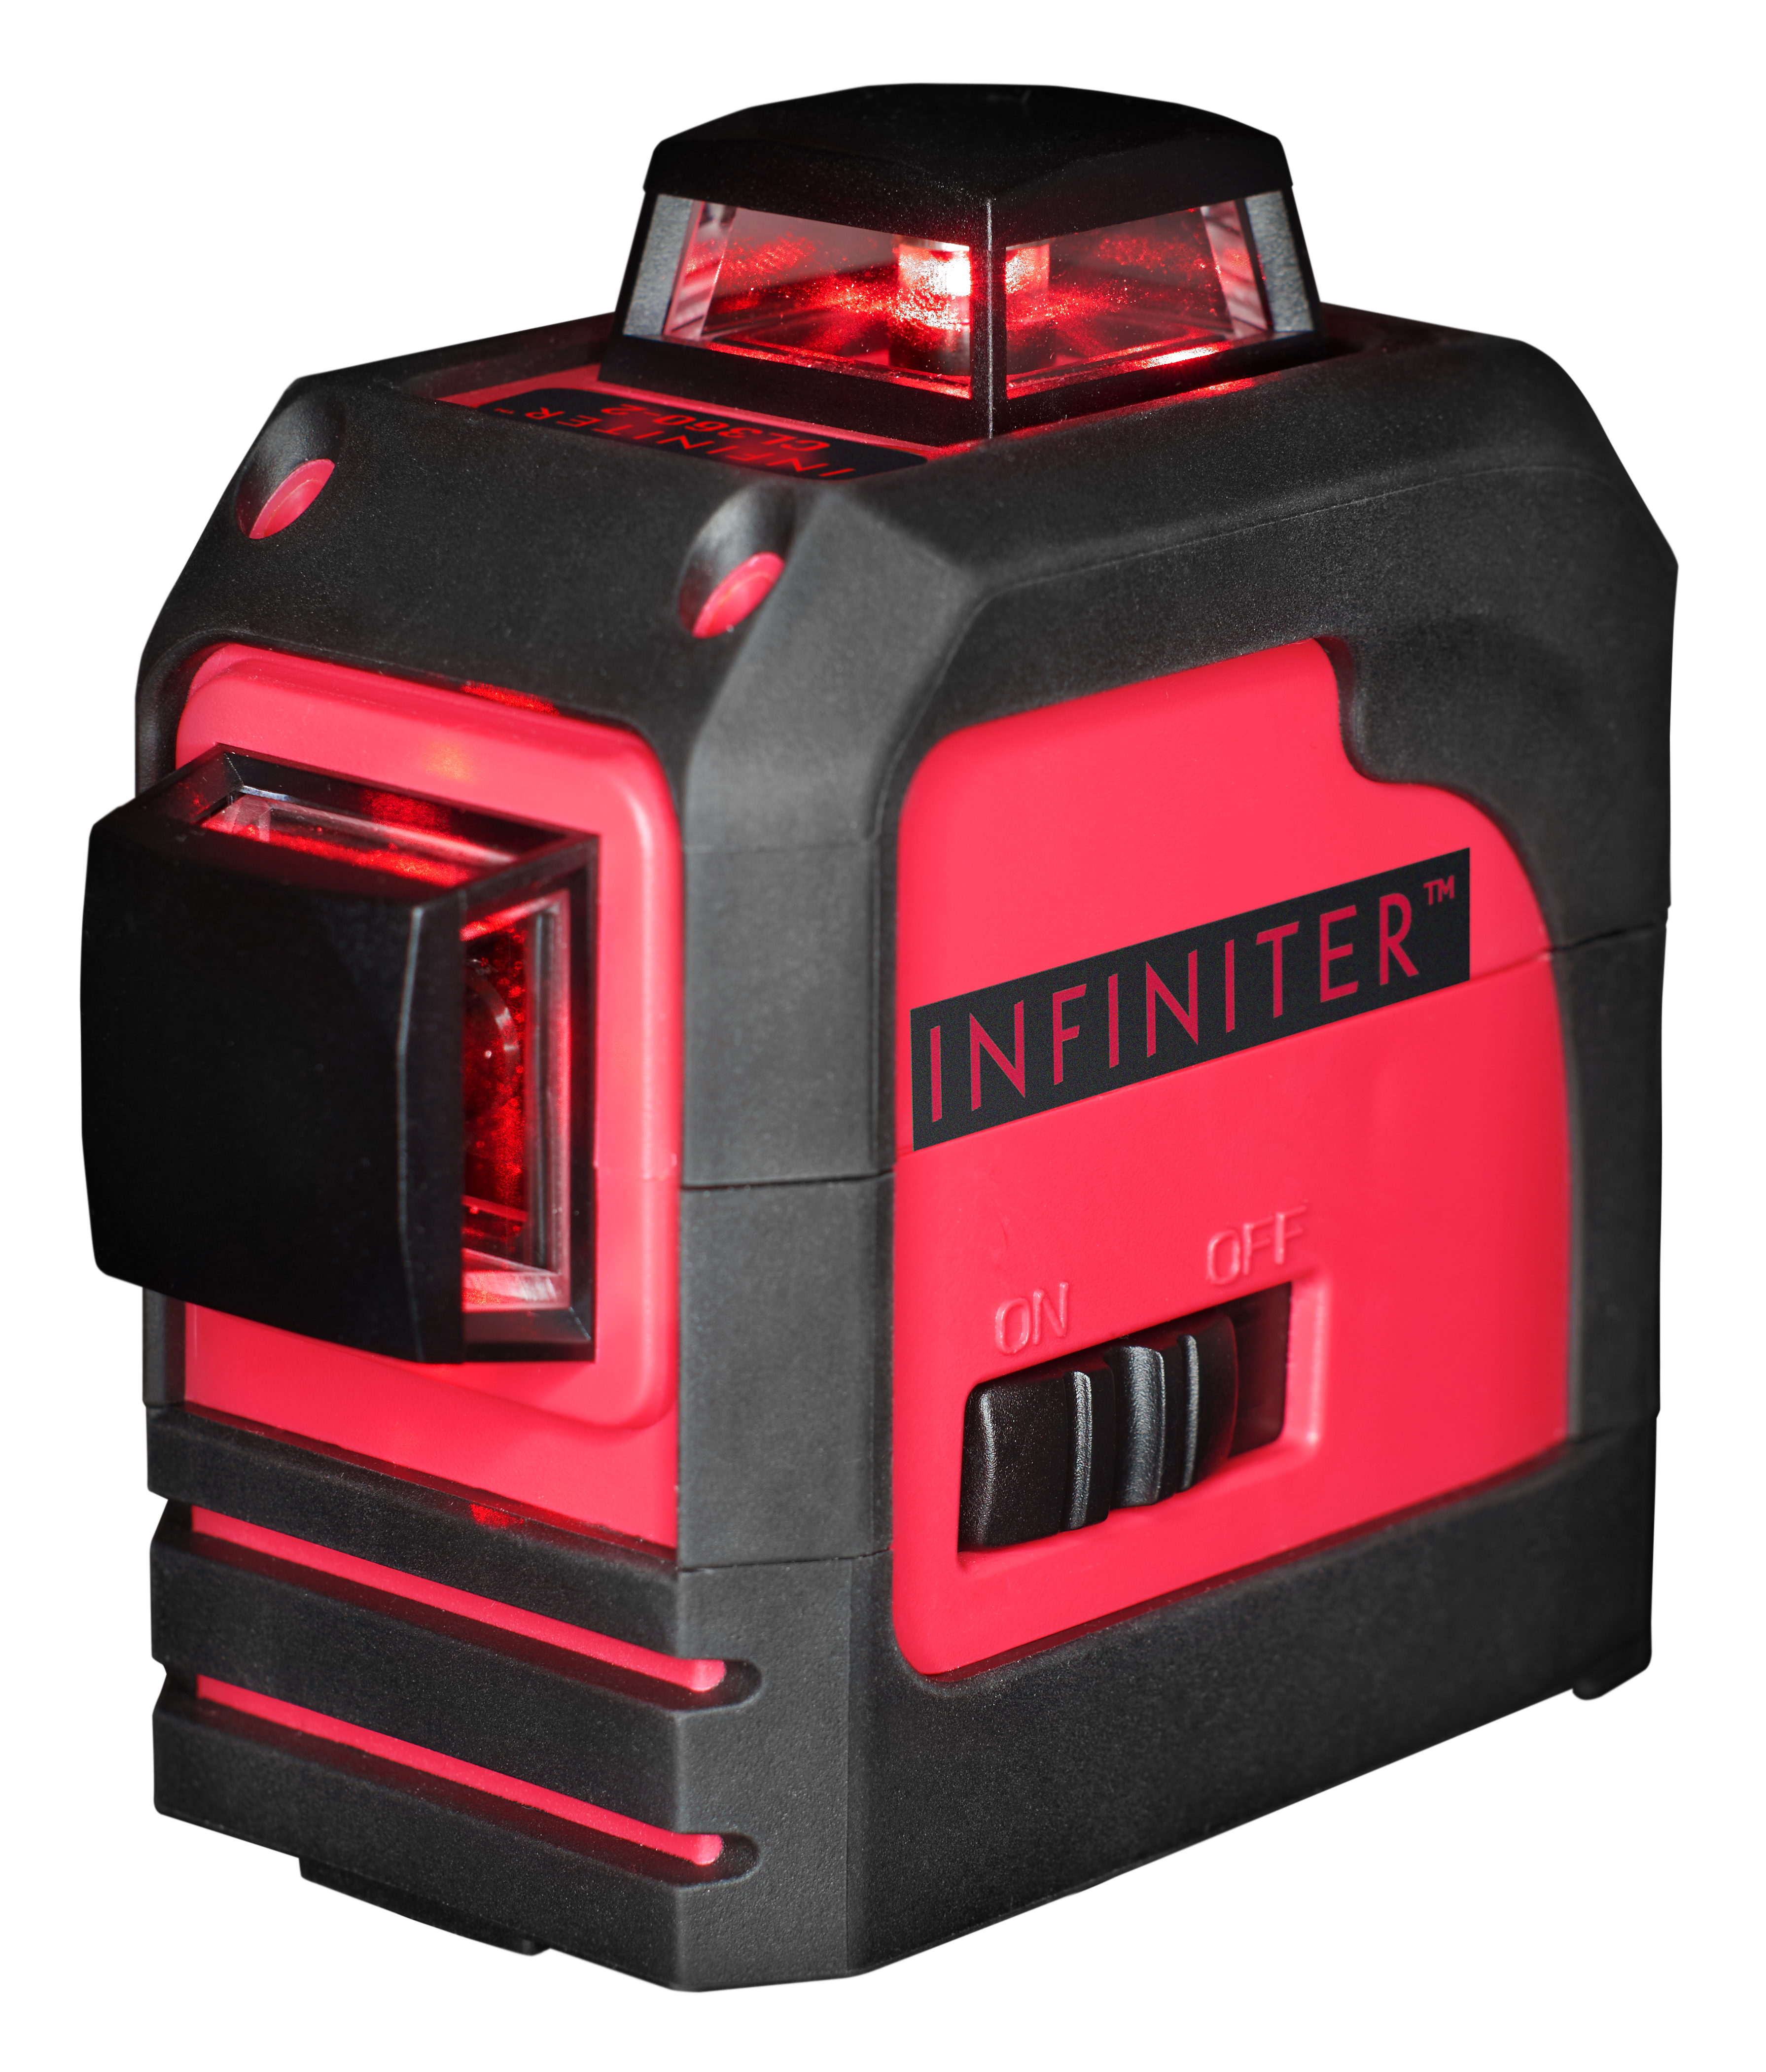 Уровень Infiniter Cl360-2  нивелир infiniter cl360 2